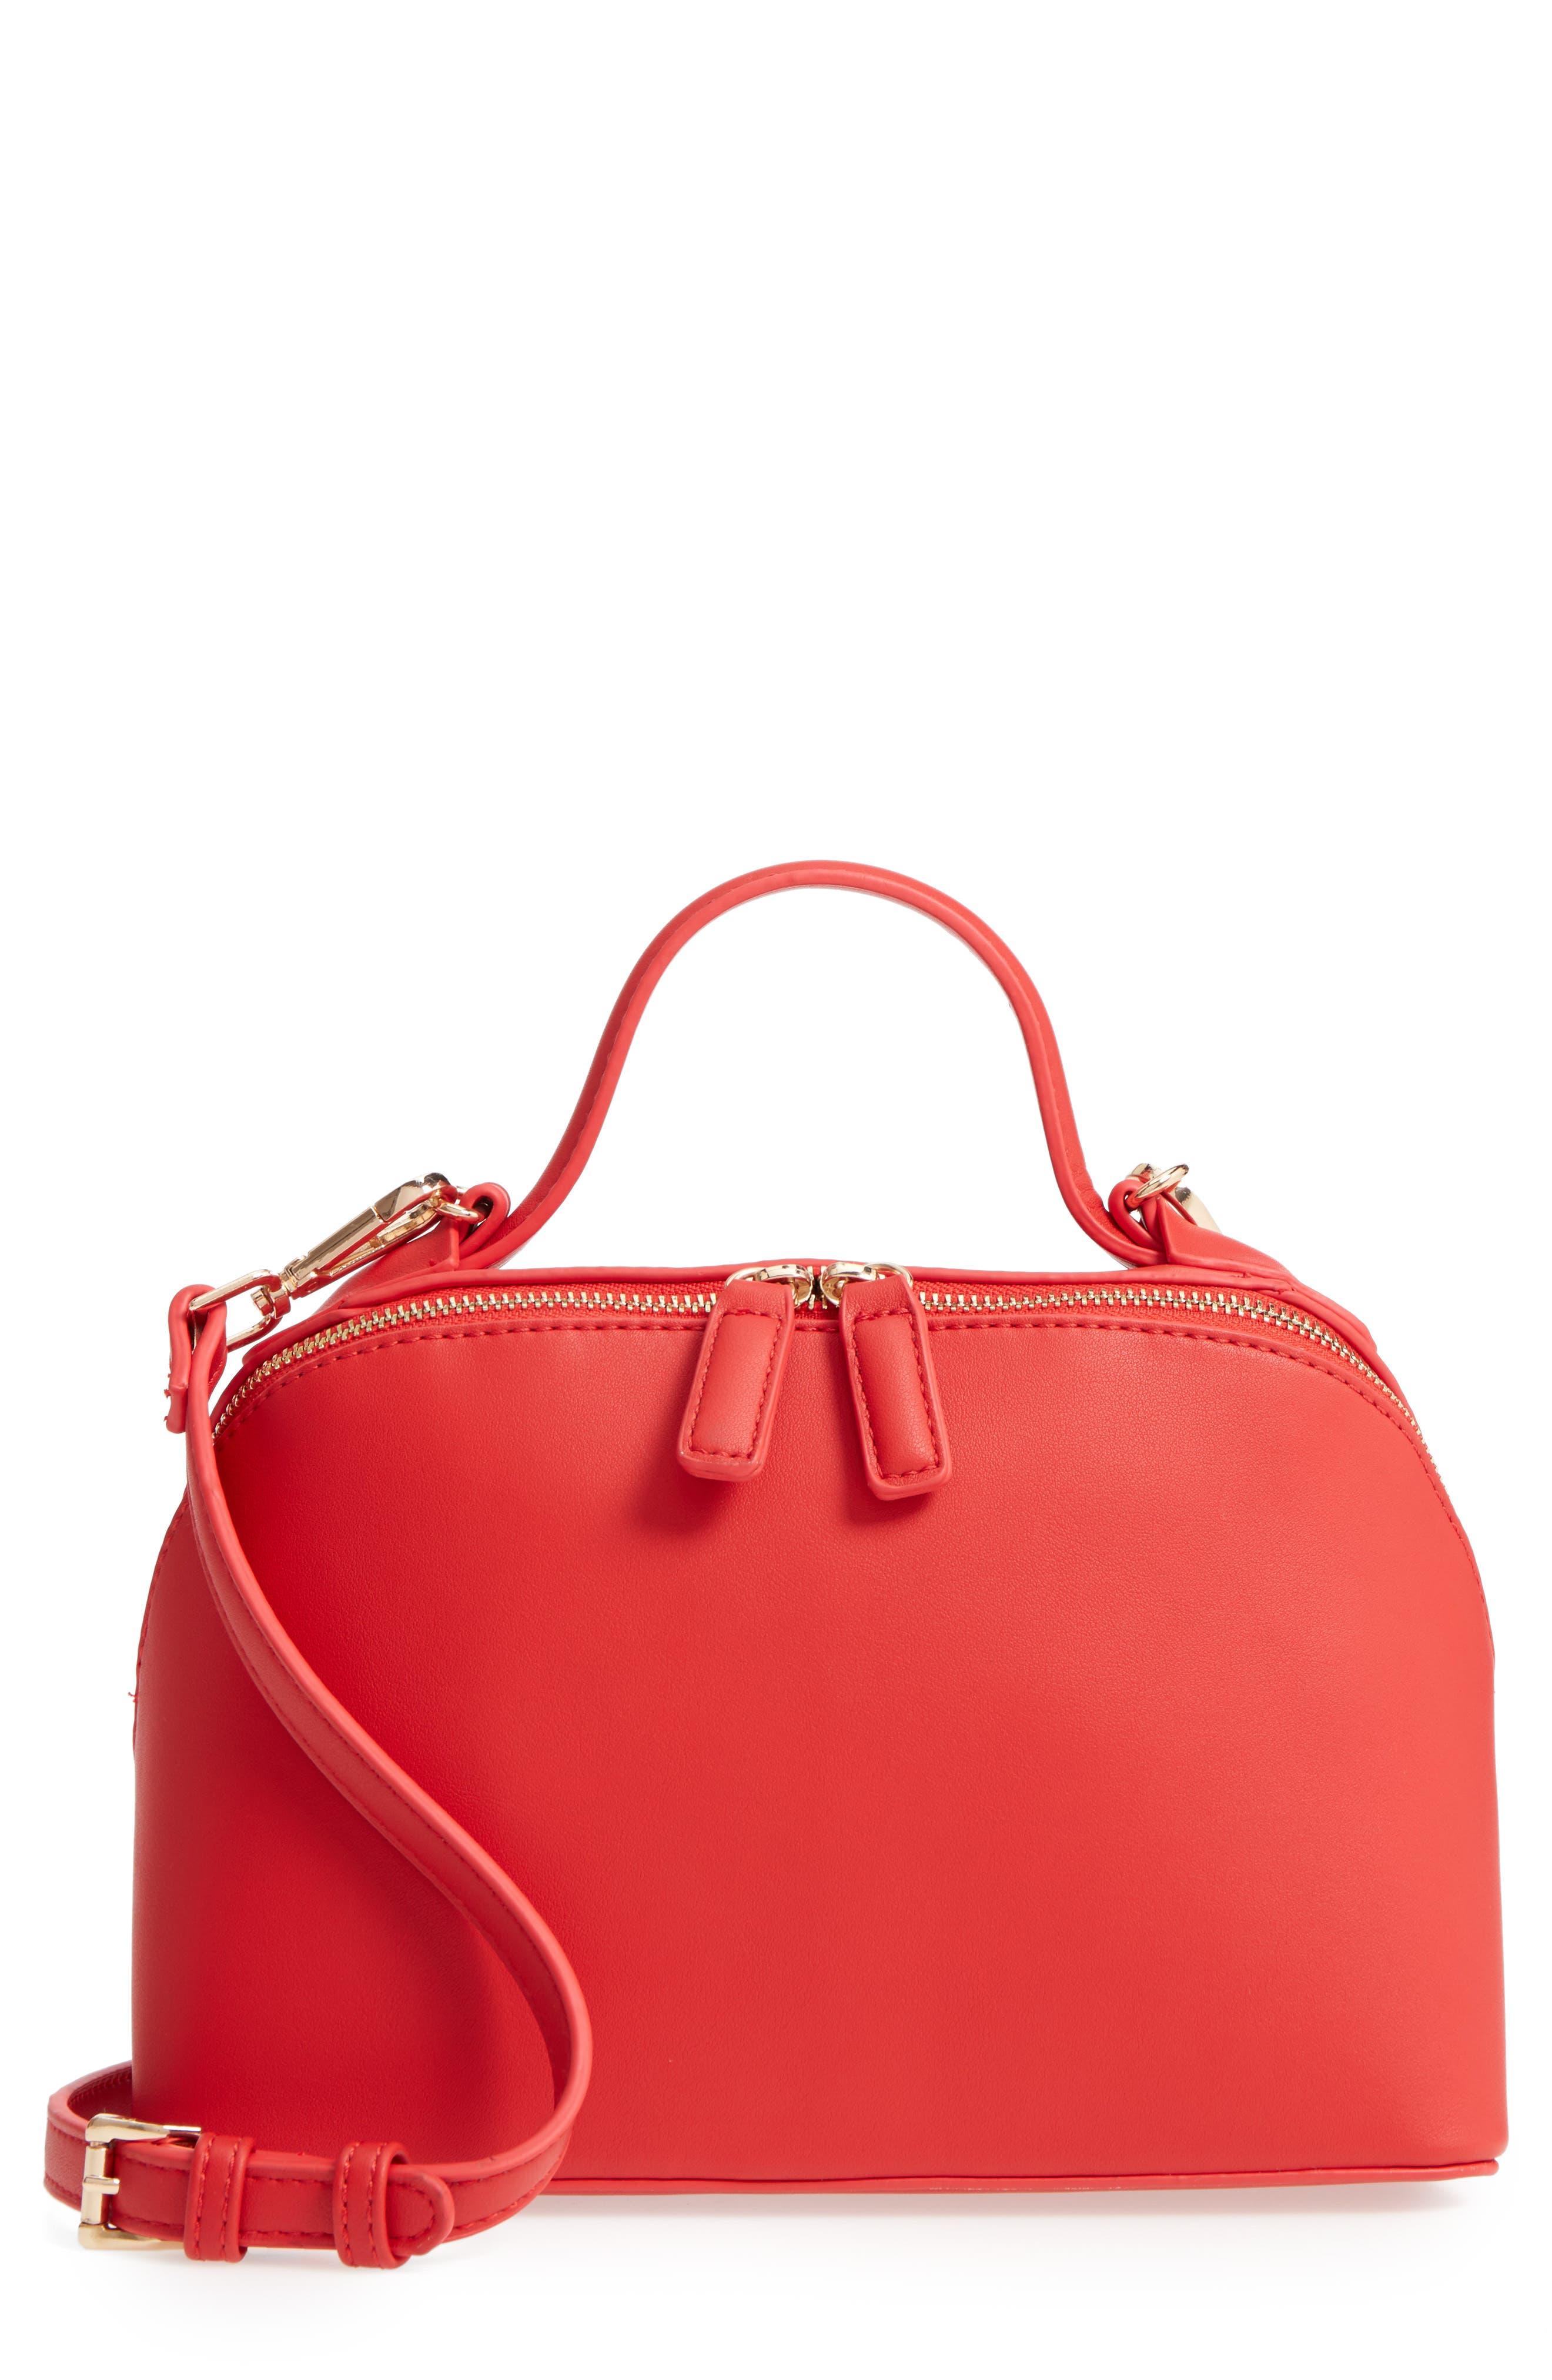 Top Handle Crossbody Bag,                             Main thumbnail 1, color,                             Red